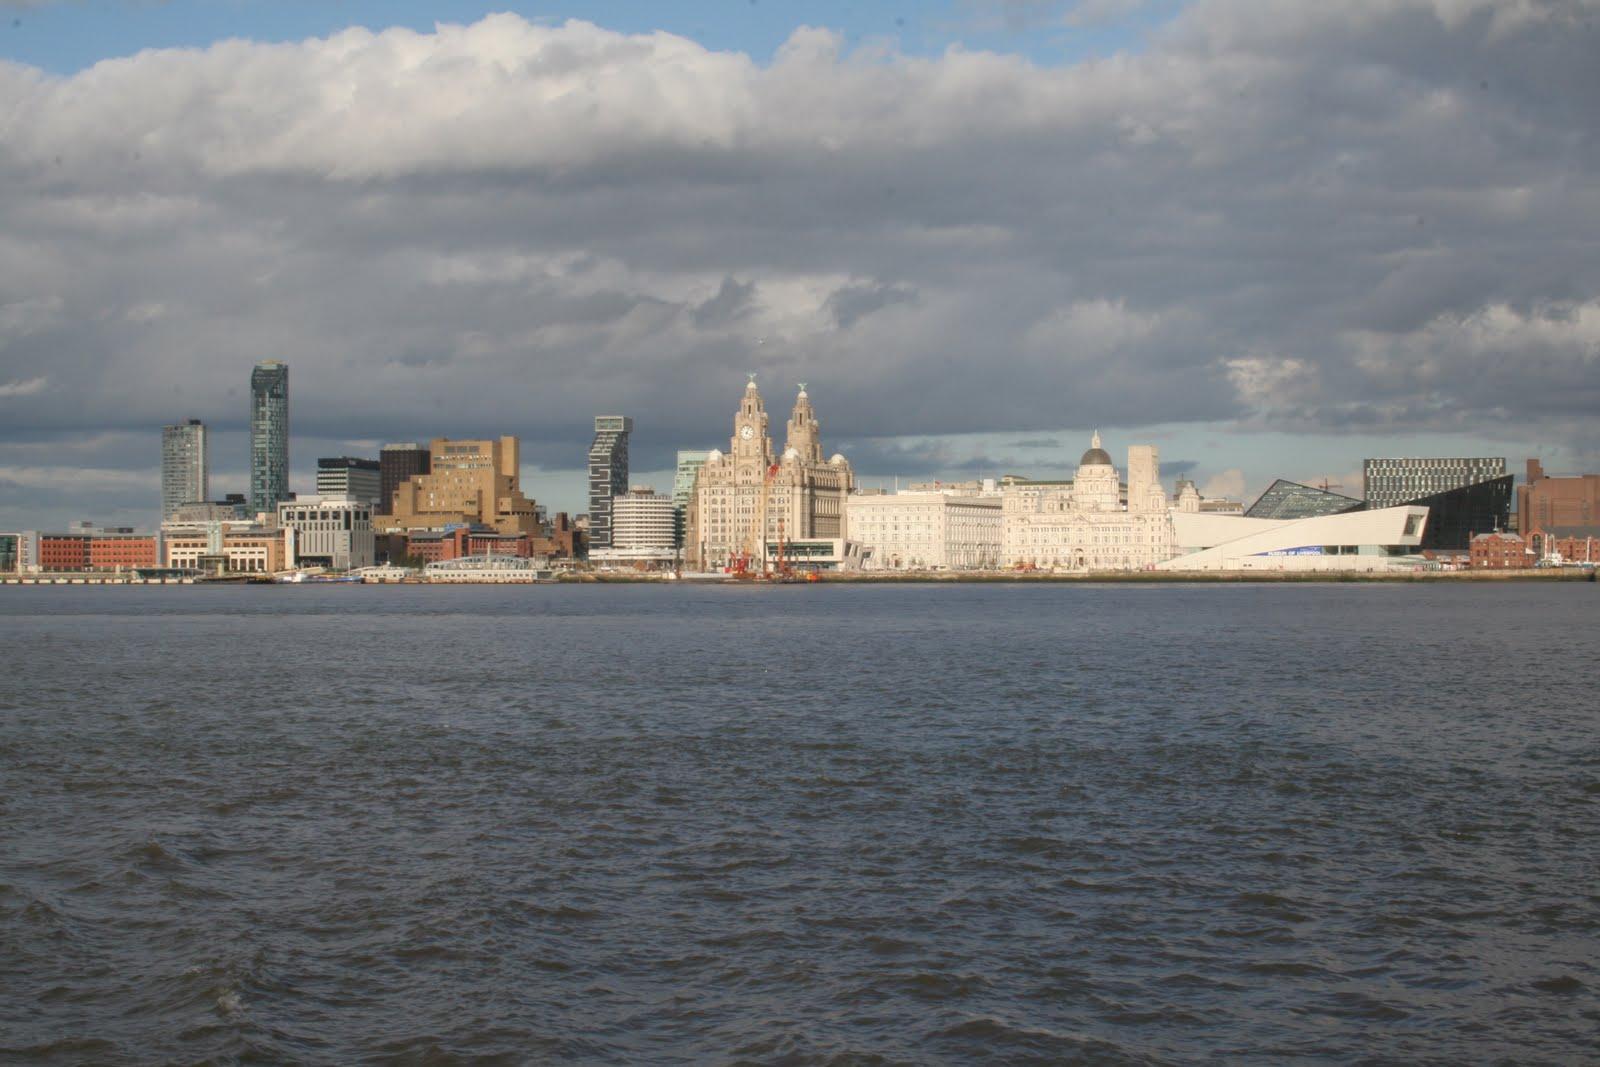 Manchester Ship Canal Cruise